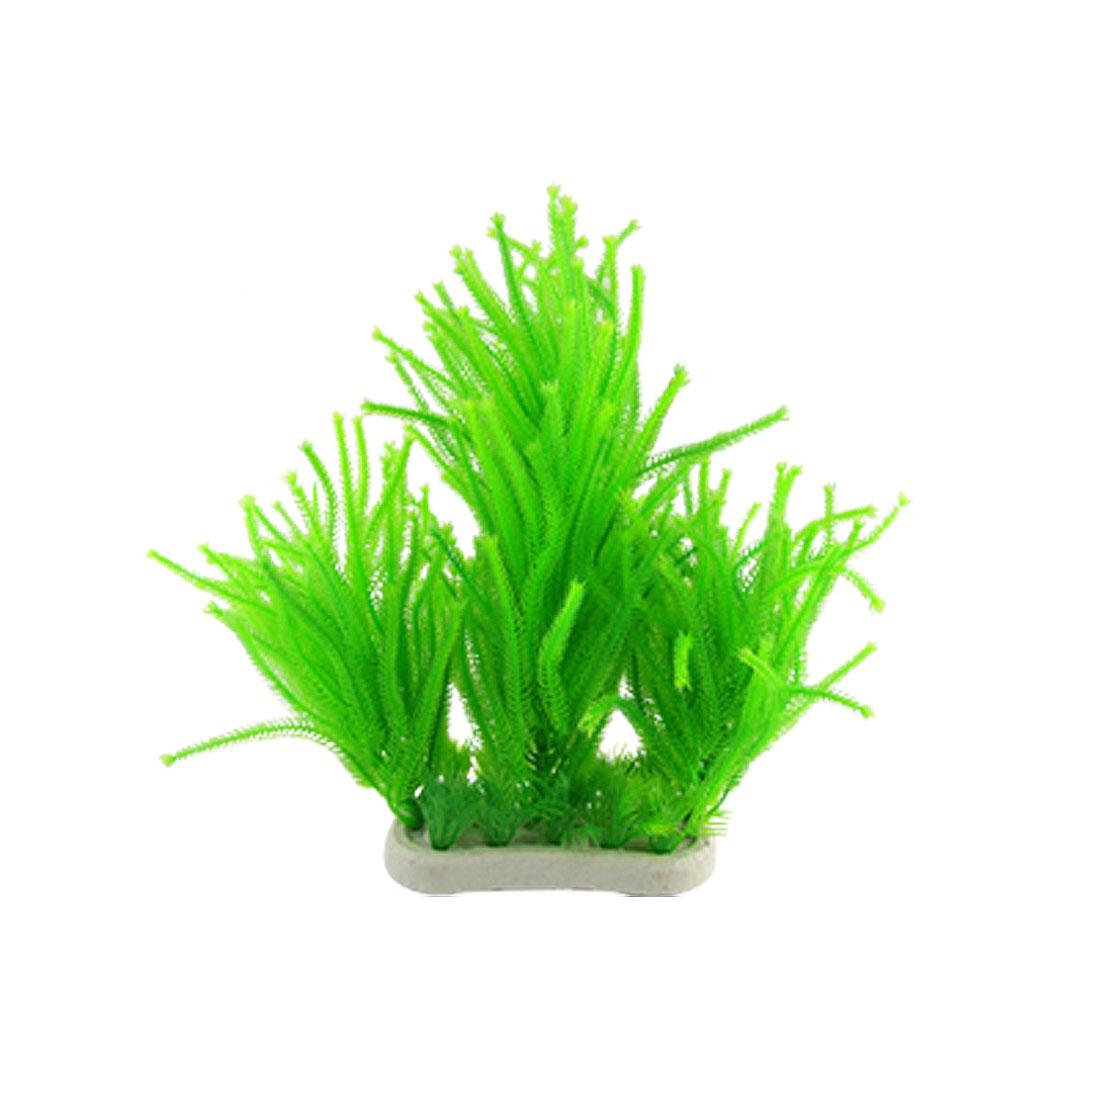 Aquarium Fish Tank Green Plastic Grass Plant Decoration